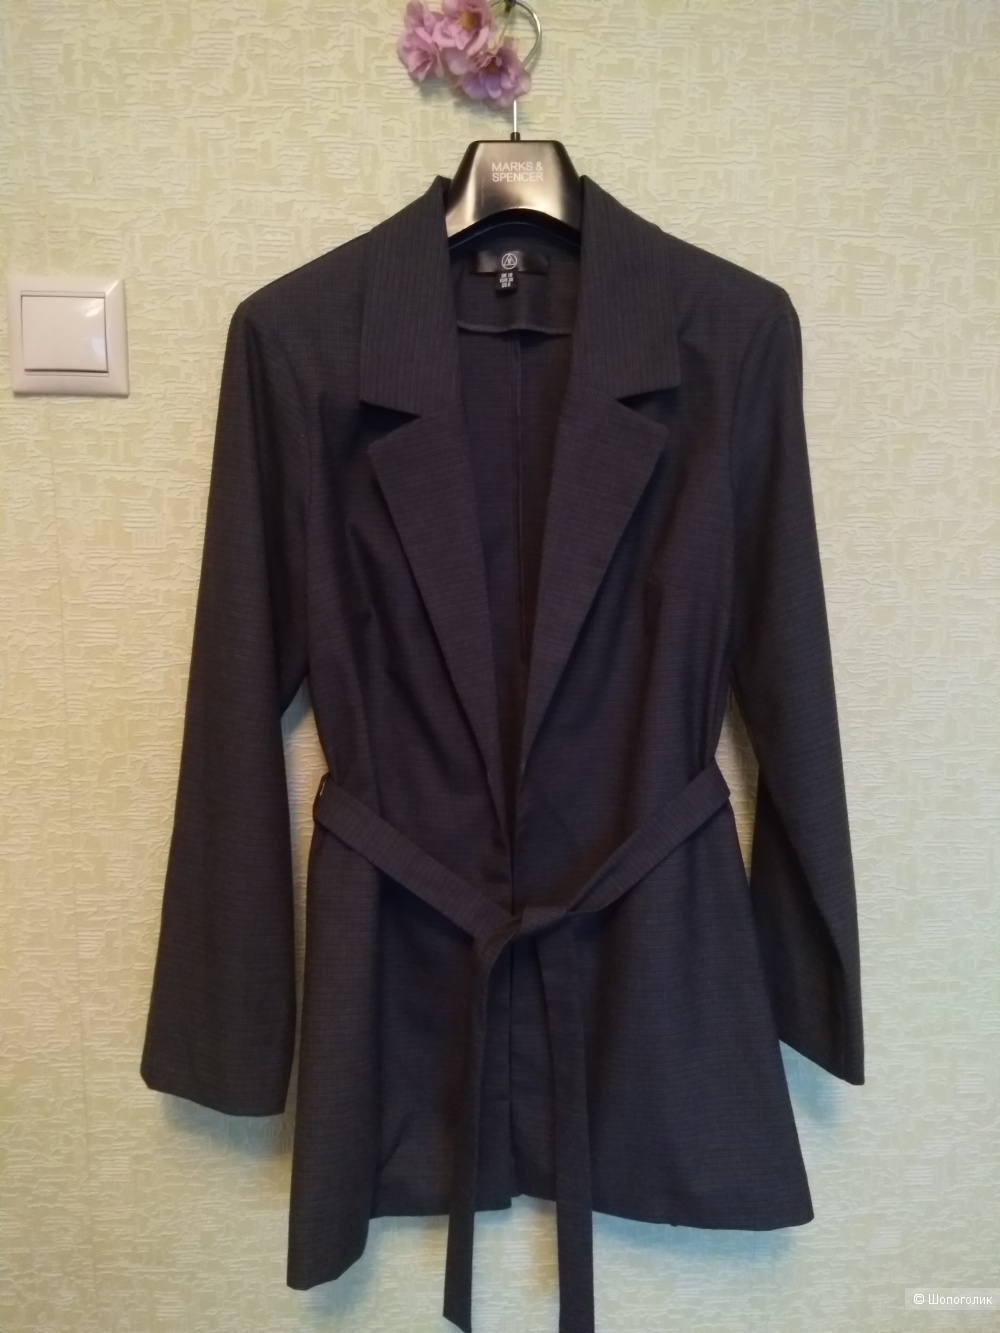 Пиджак MISSGUIDED, размер M/L